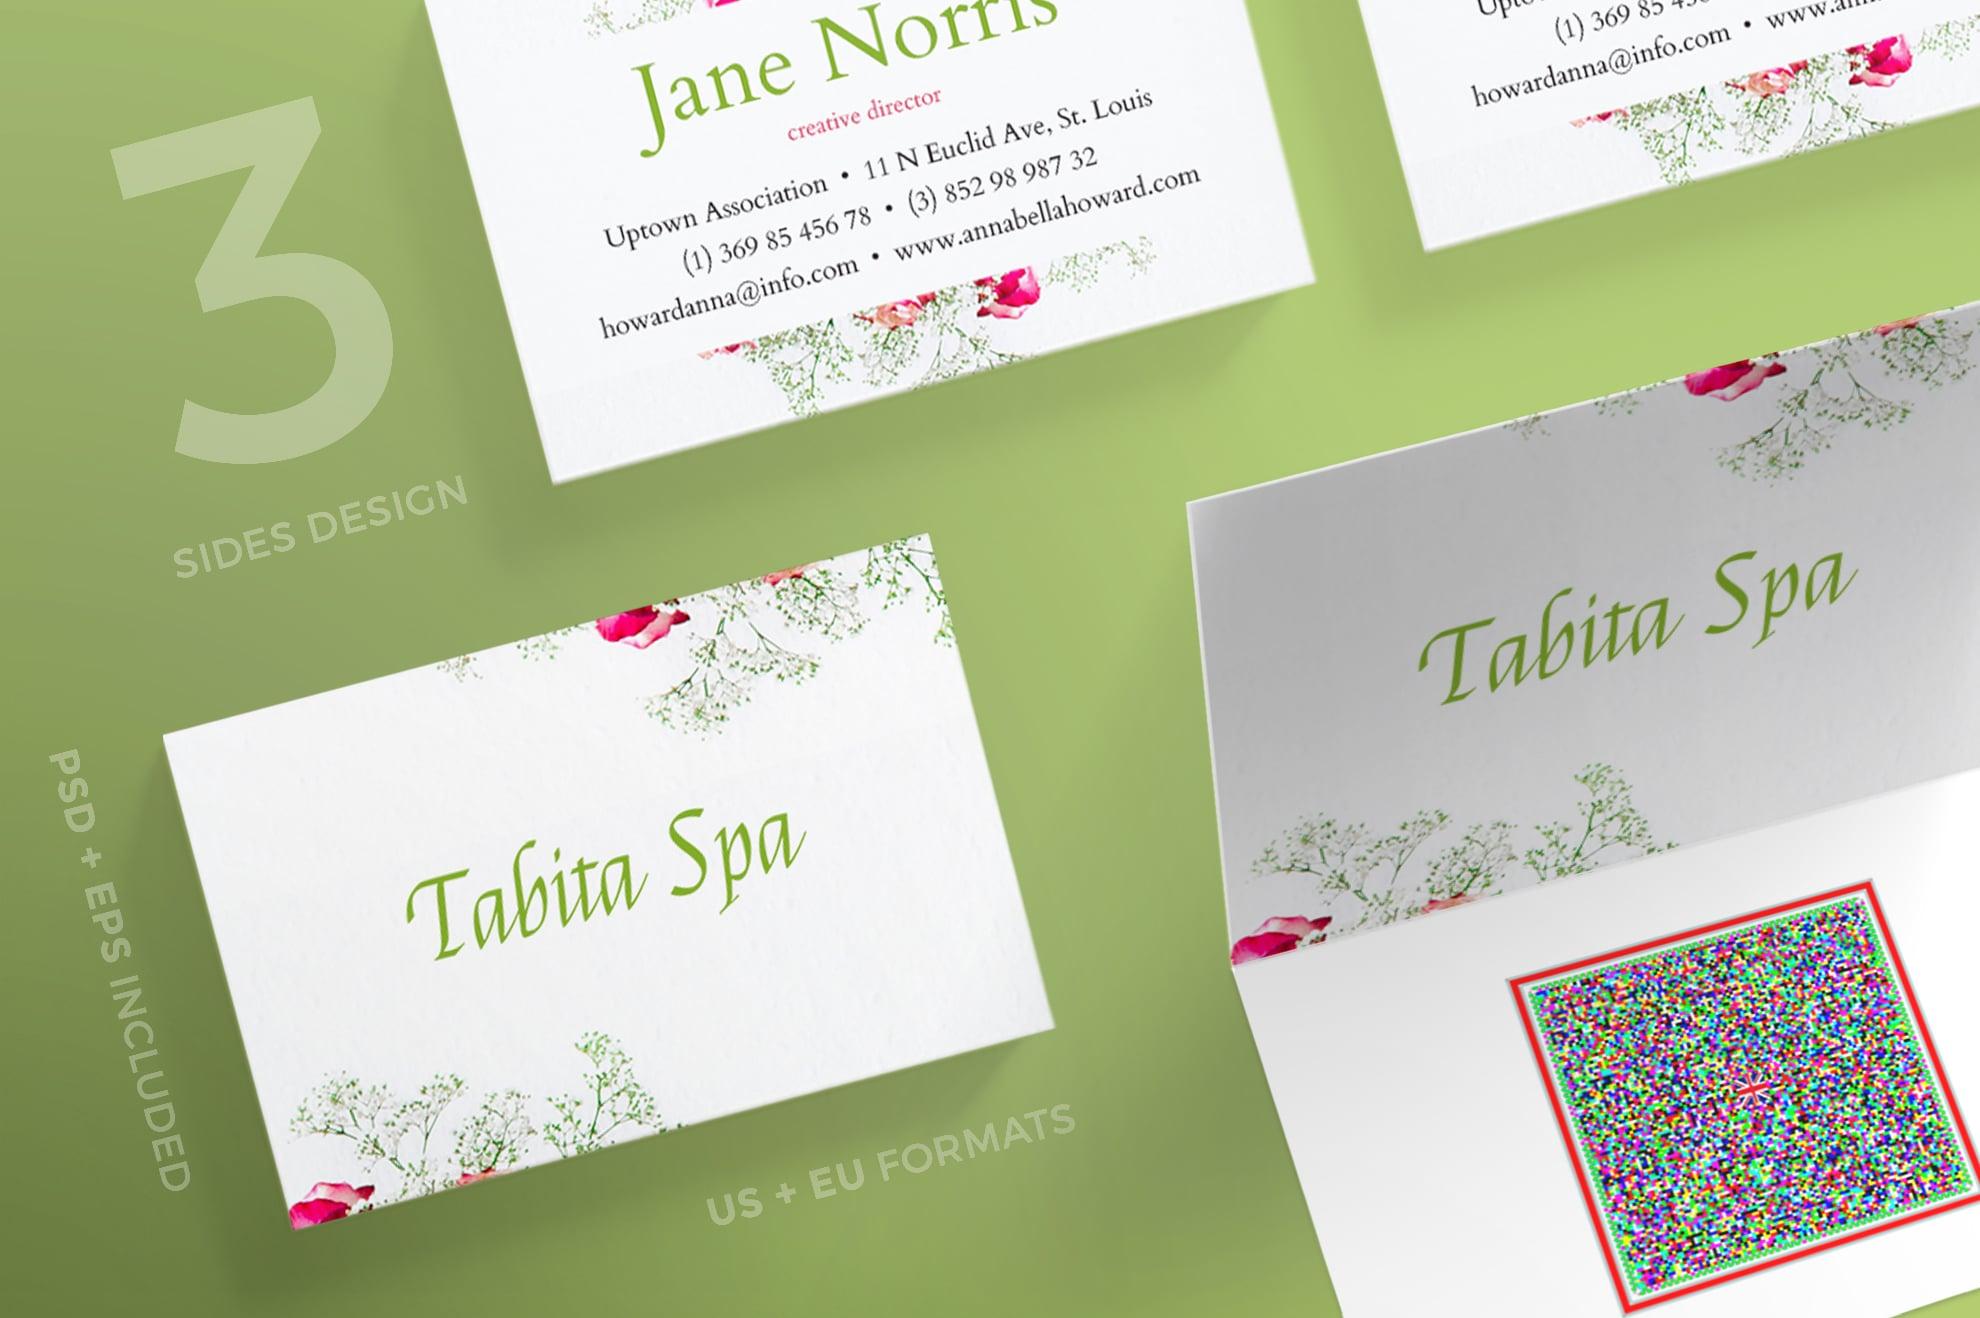 110 in 1 Business Card Bundle - 003 bc tabita spa 29 0